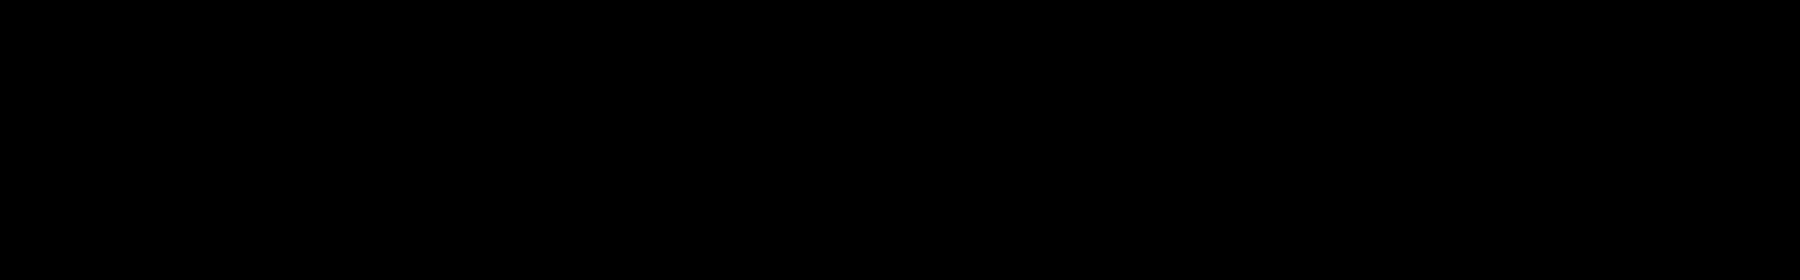 Heart of Glass audio waveform